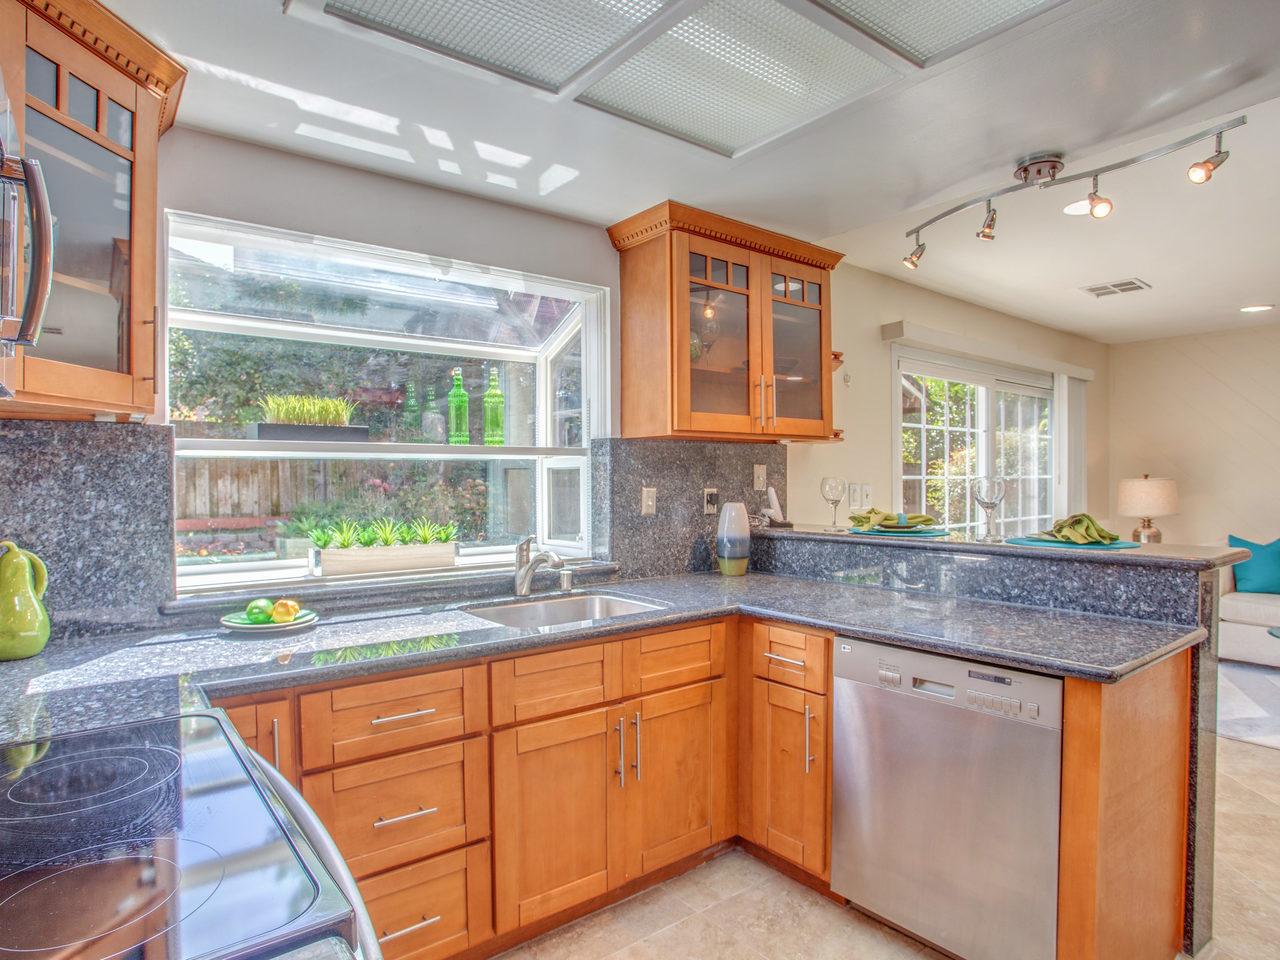 4620 Kelso St Union City CA-MLS_Size-008-9-Kitchen-1280x960-72dpi.jpg